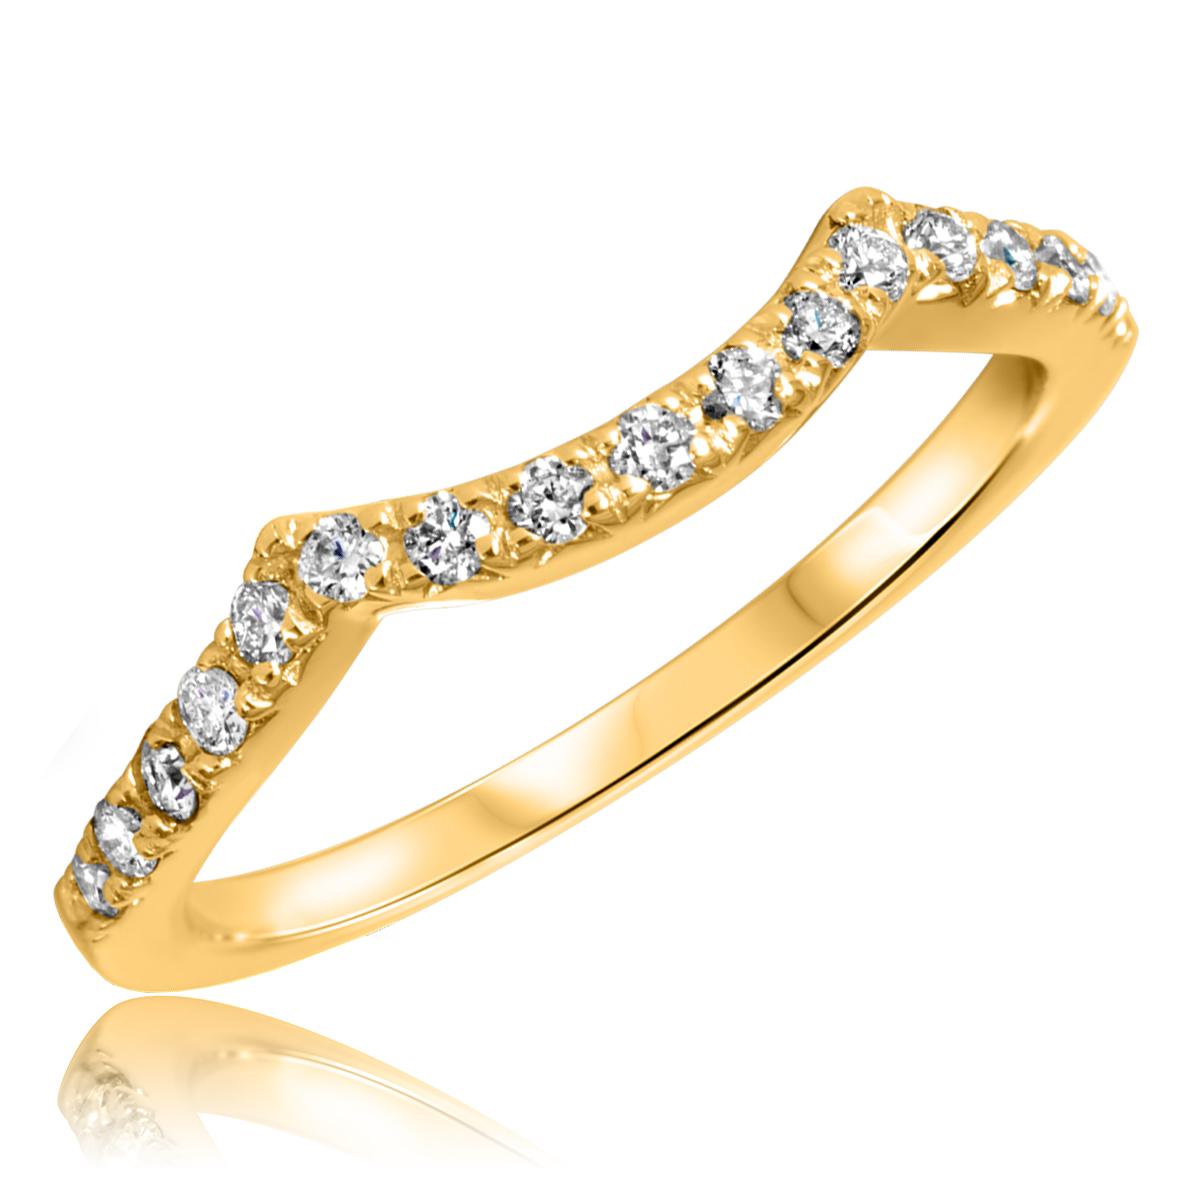 1/3 Carat T.W. Round Cut Diamond Ladies Wedding Band 10K Yellow Gold- Size 8